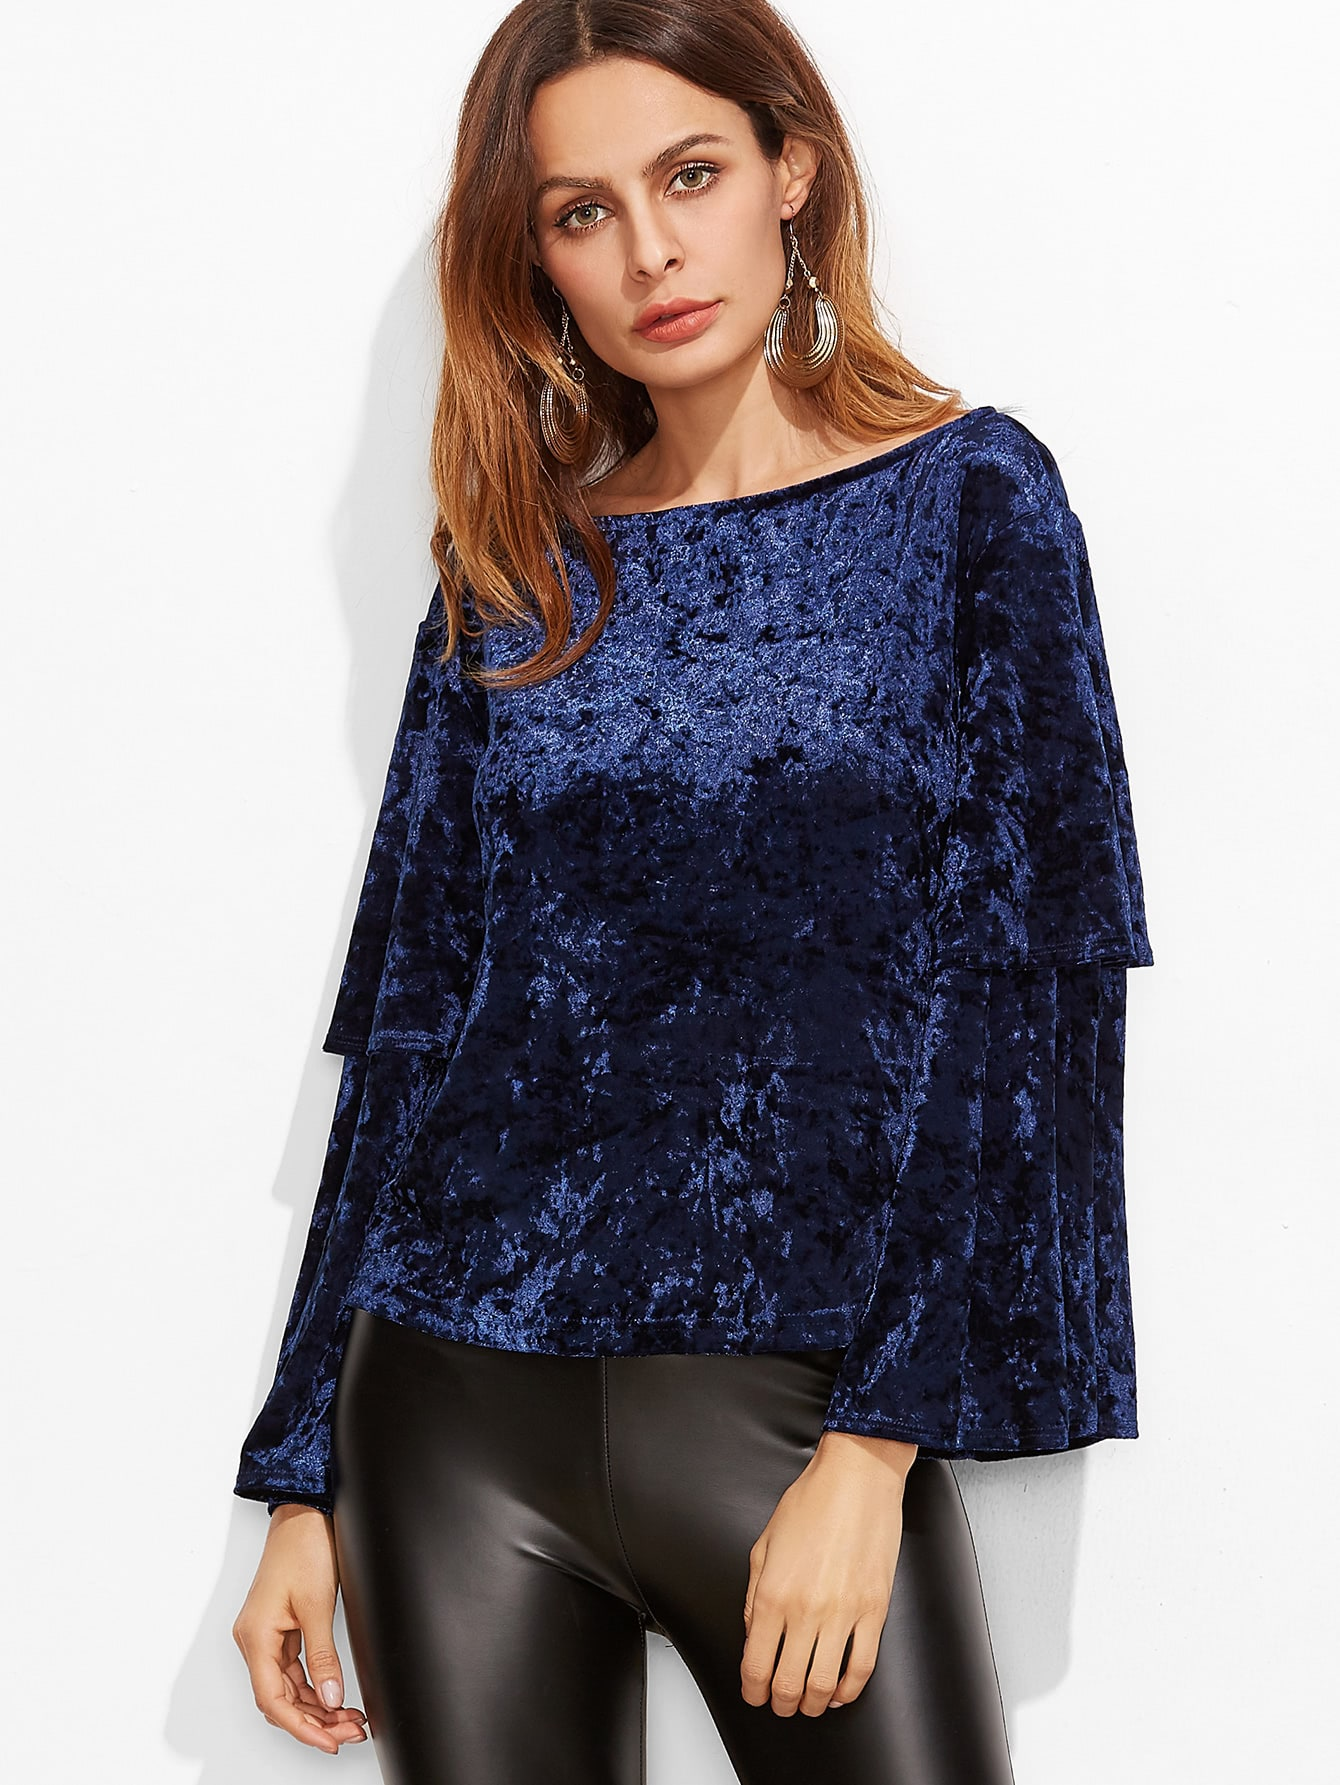 blouse161207705_2